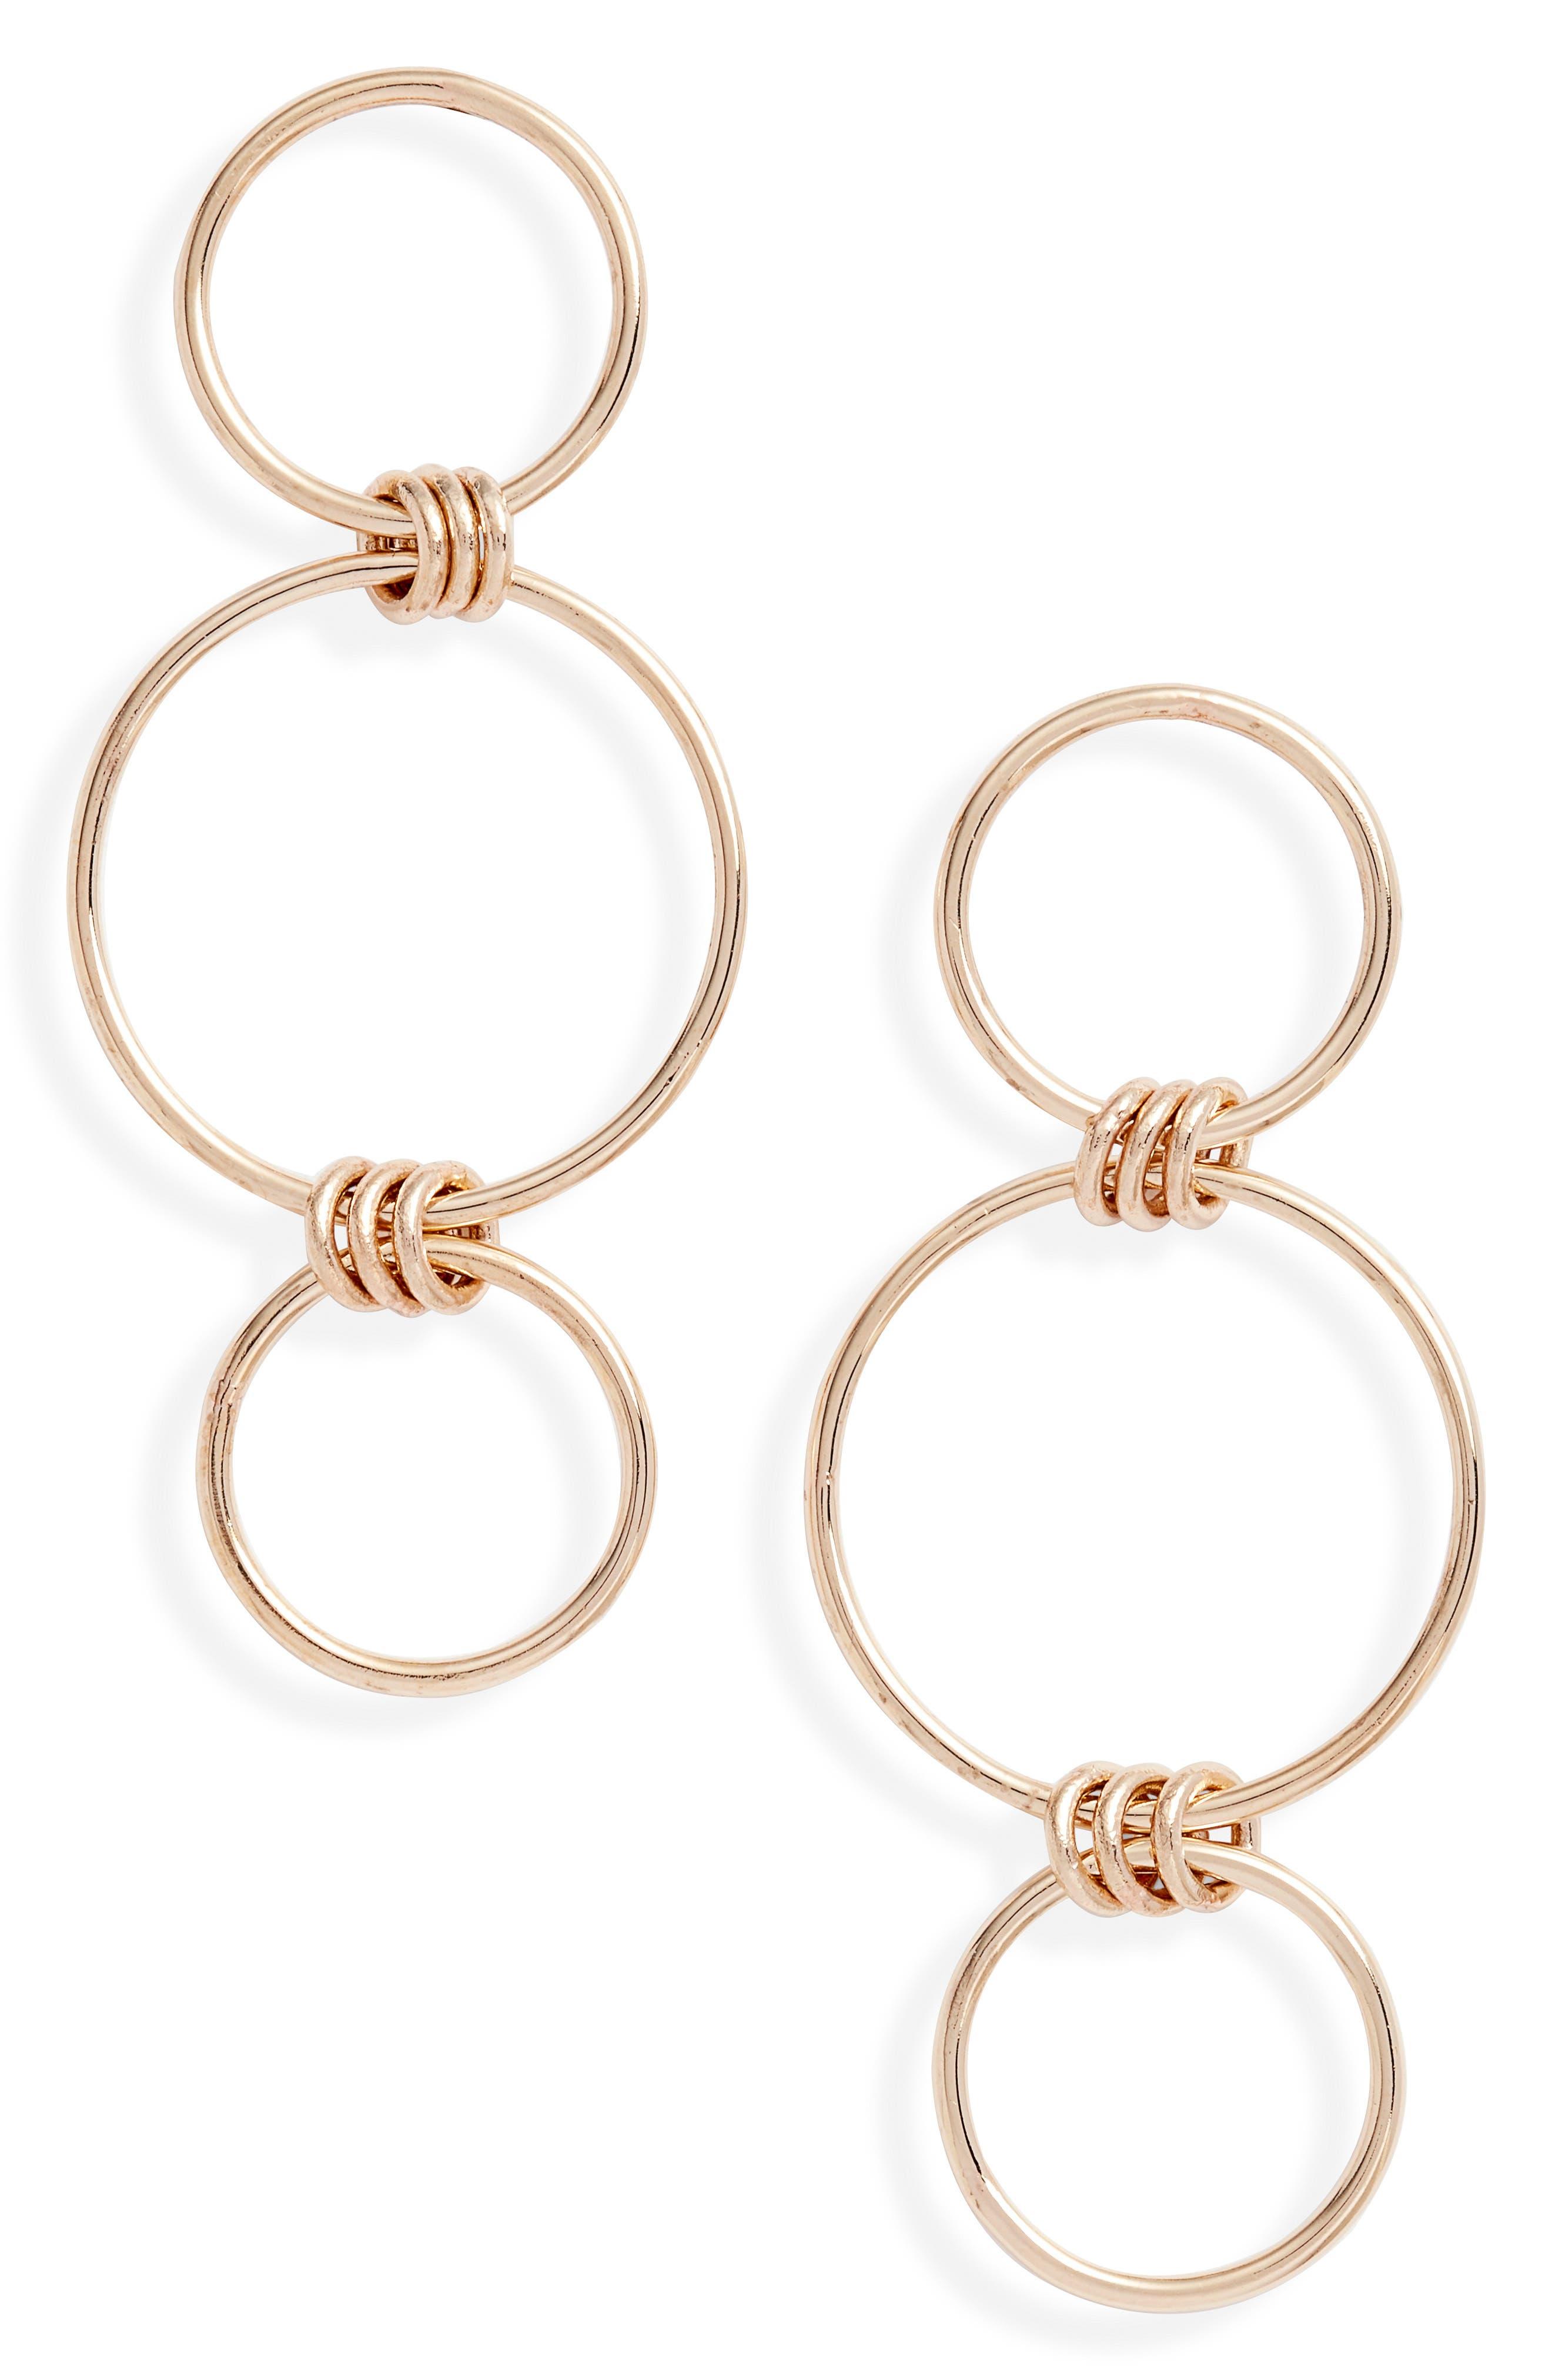 Zoe Chicco Mixed Circle Drop Earrings